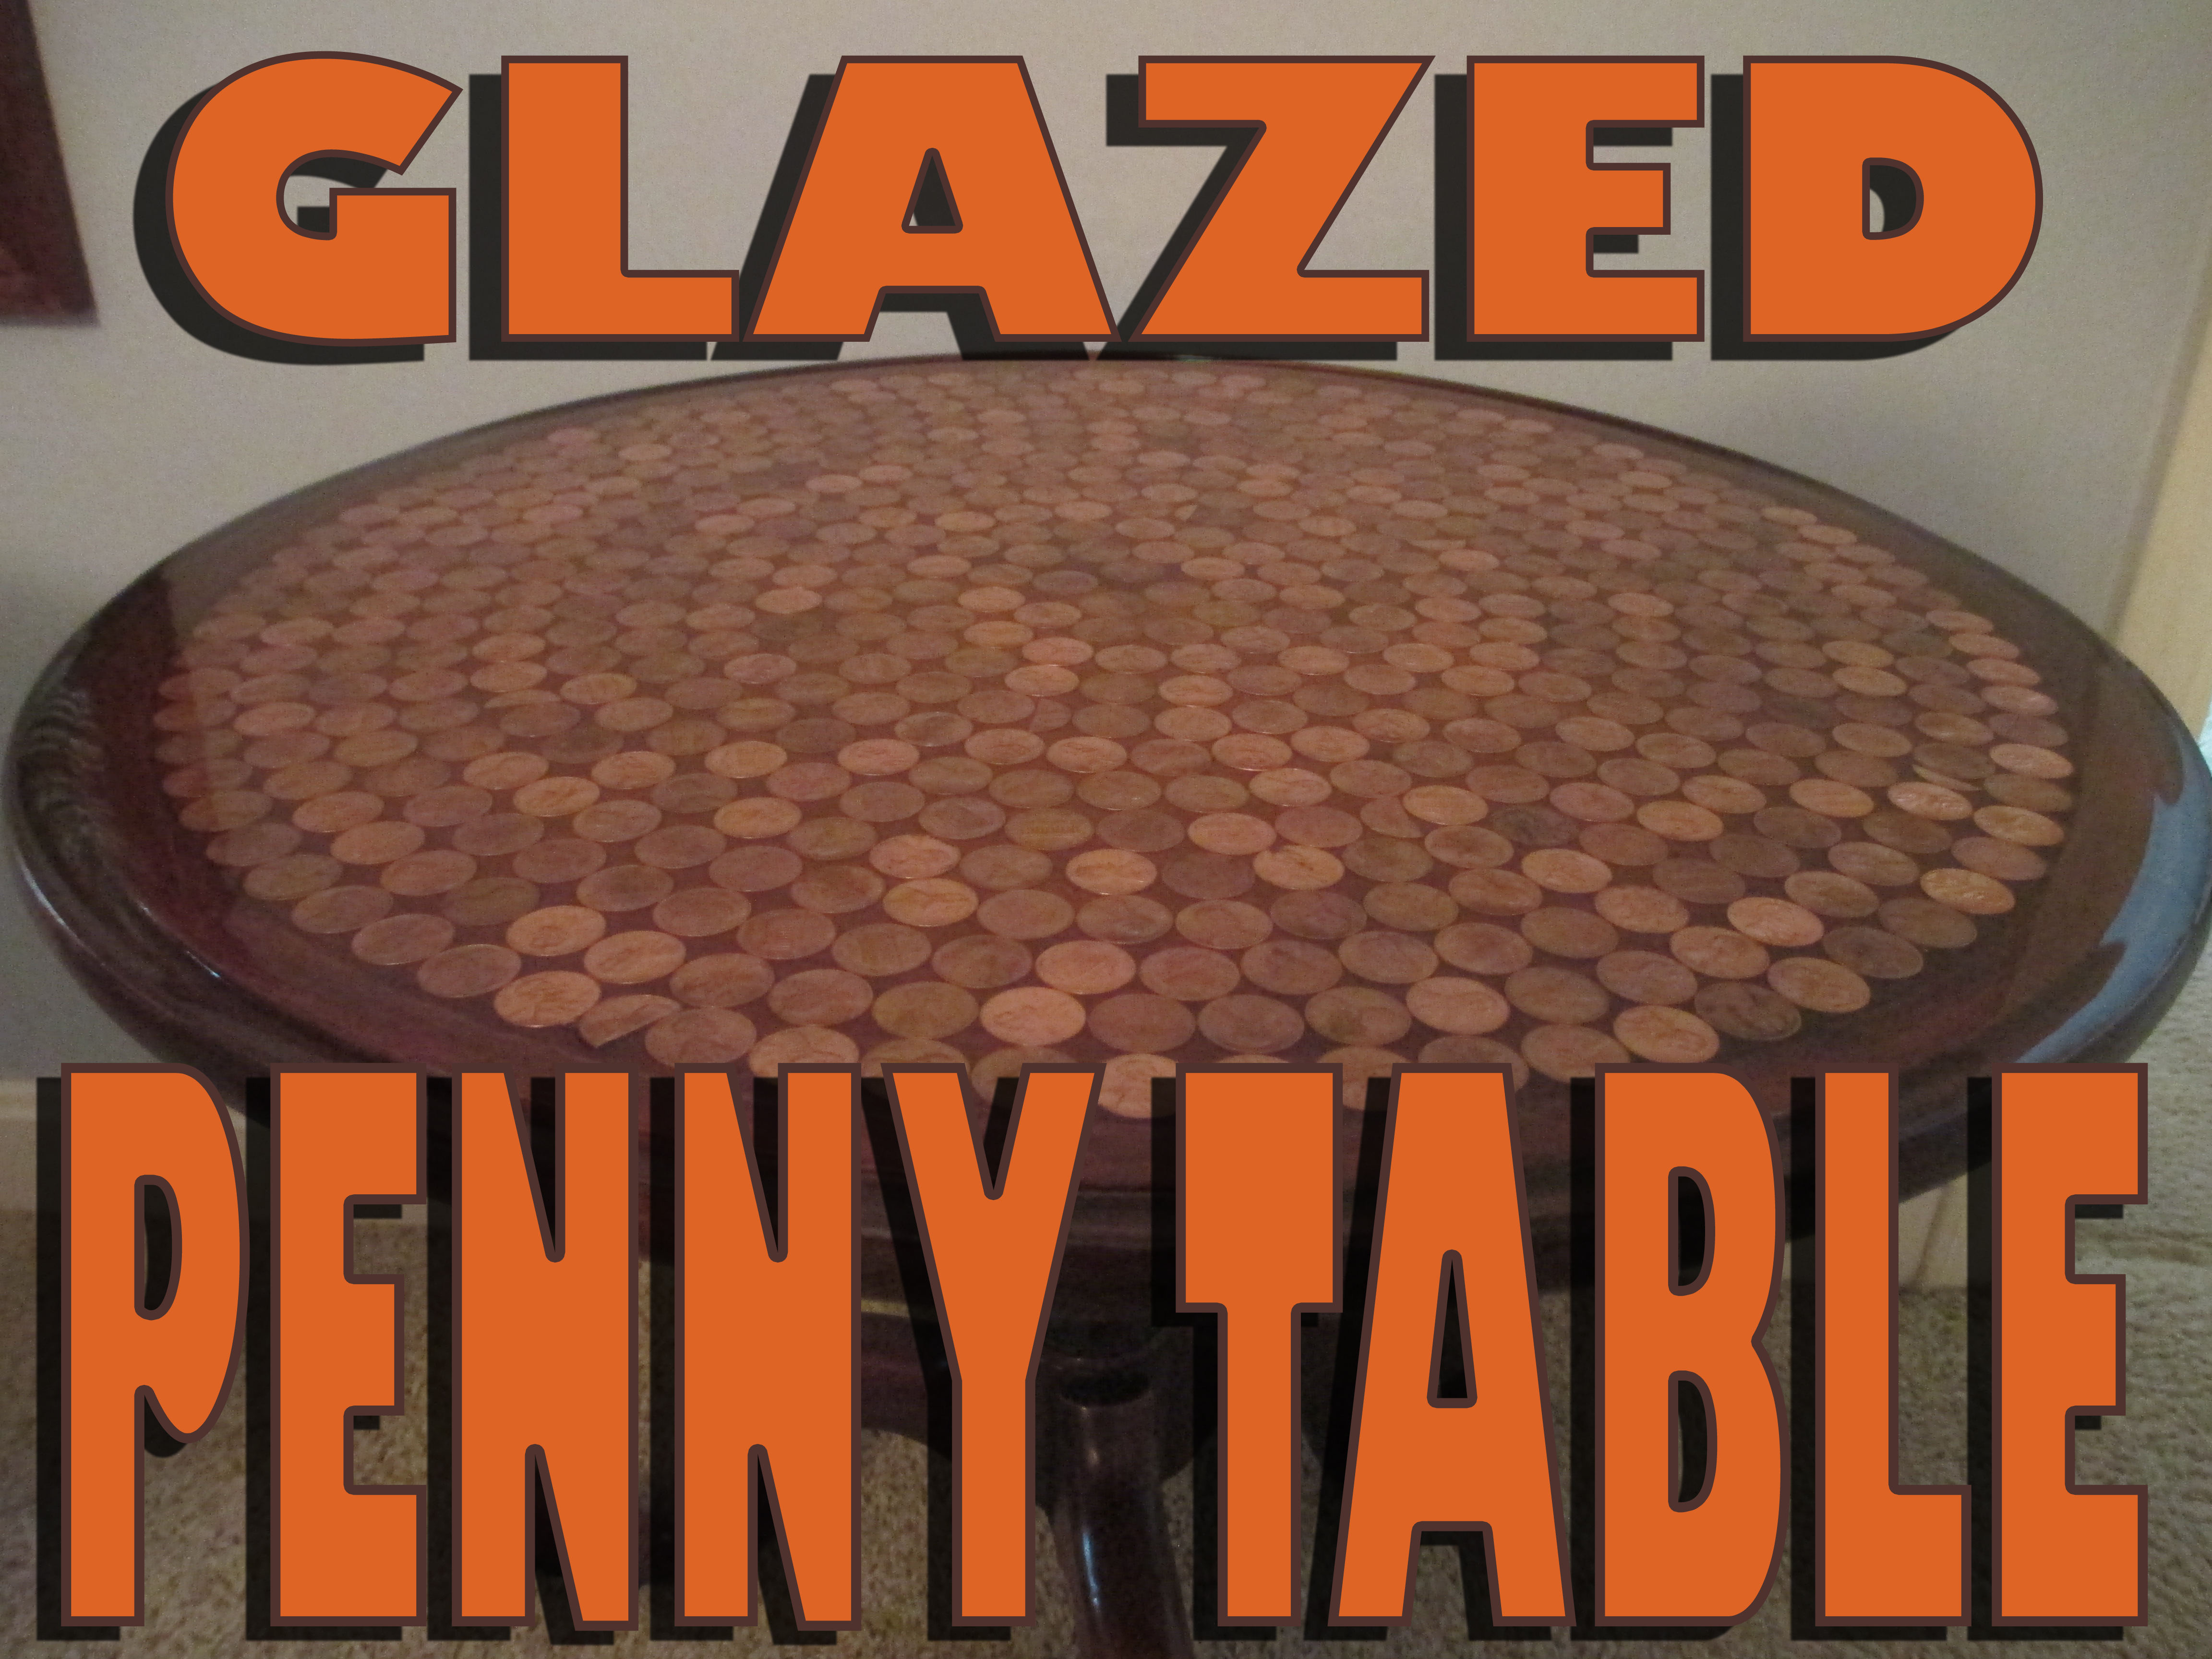 Glazed Penny Table